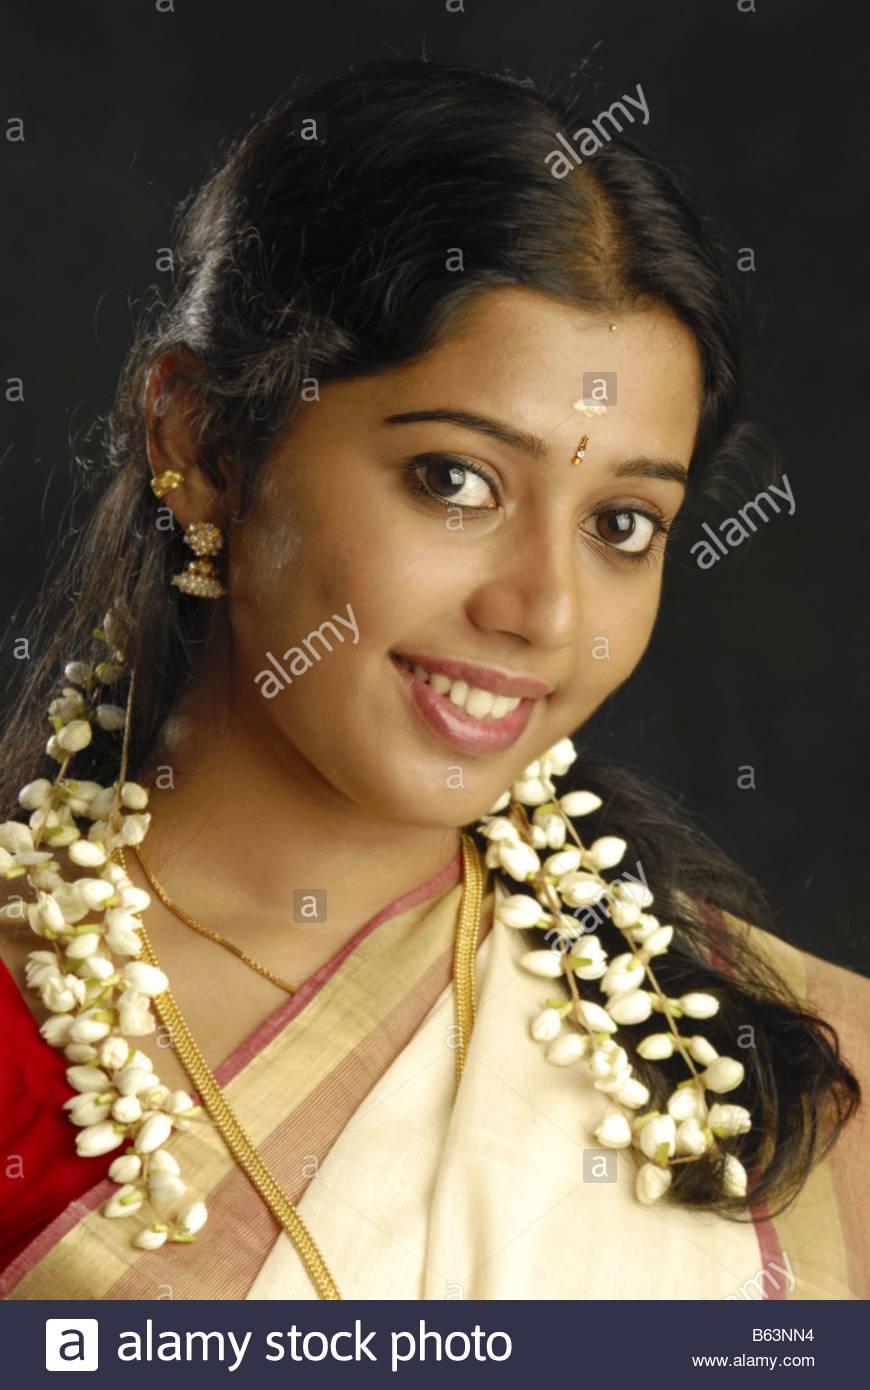 Merveilleux Kerala Model Stock Photos U0026 Kerala Model Stock Images   Alamy